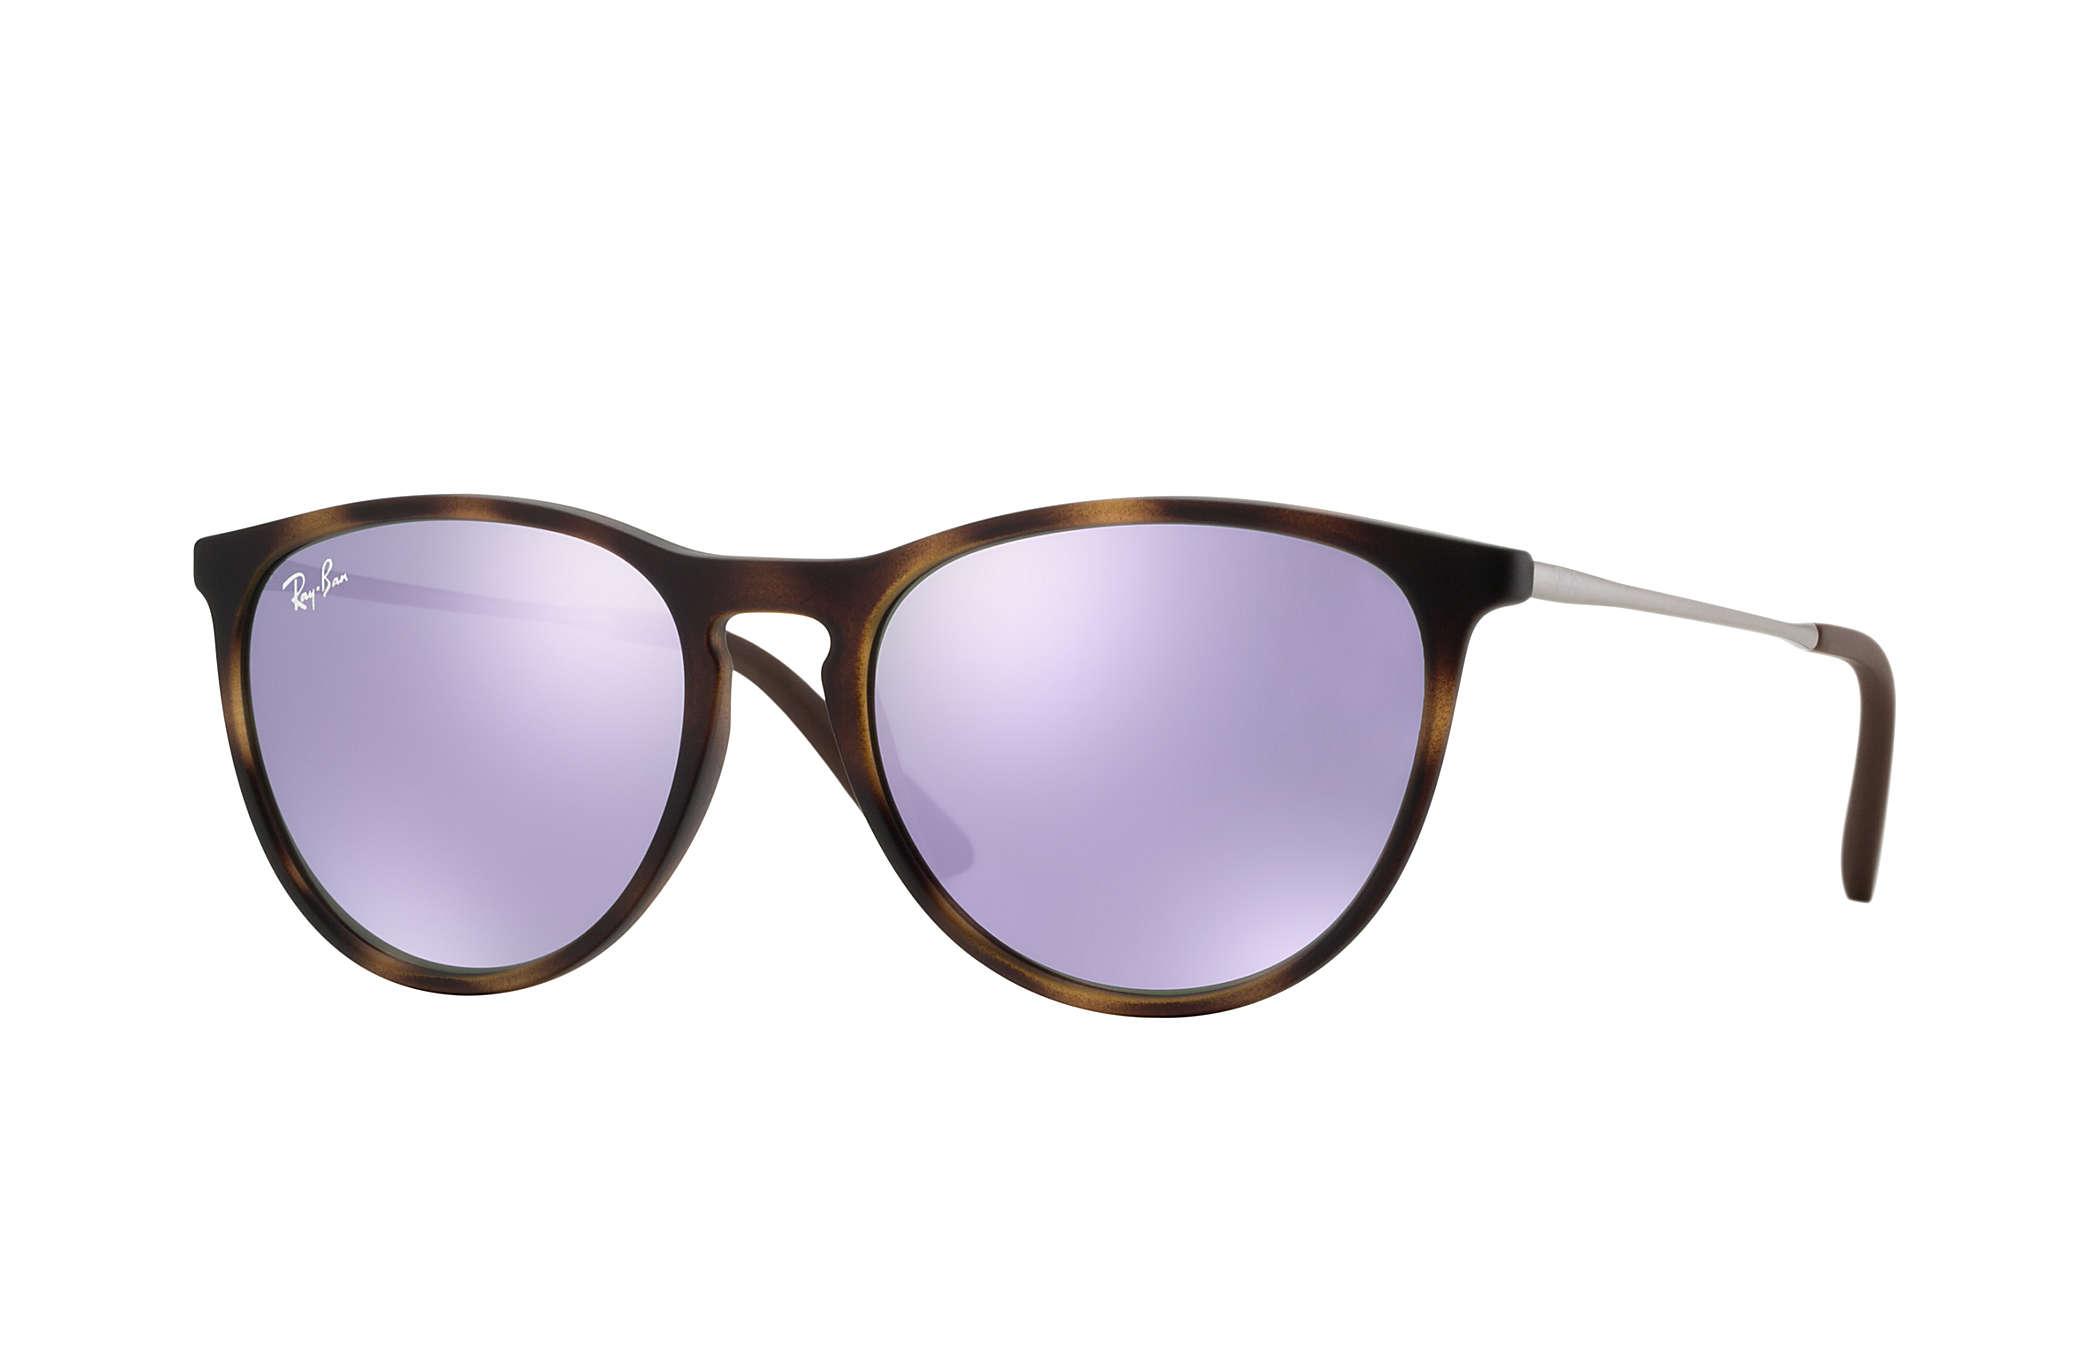 aef3f58024405 Ray-Ban Izzy RB9060S Tortoise - Nylon - Lilac Lenses ...